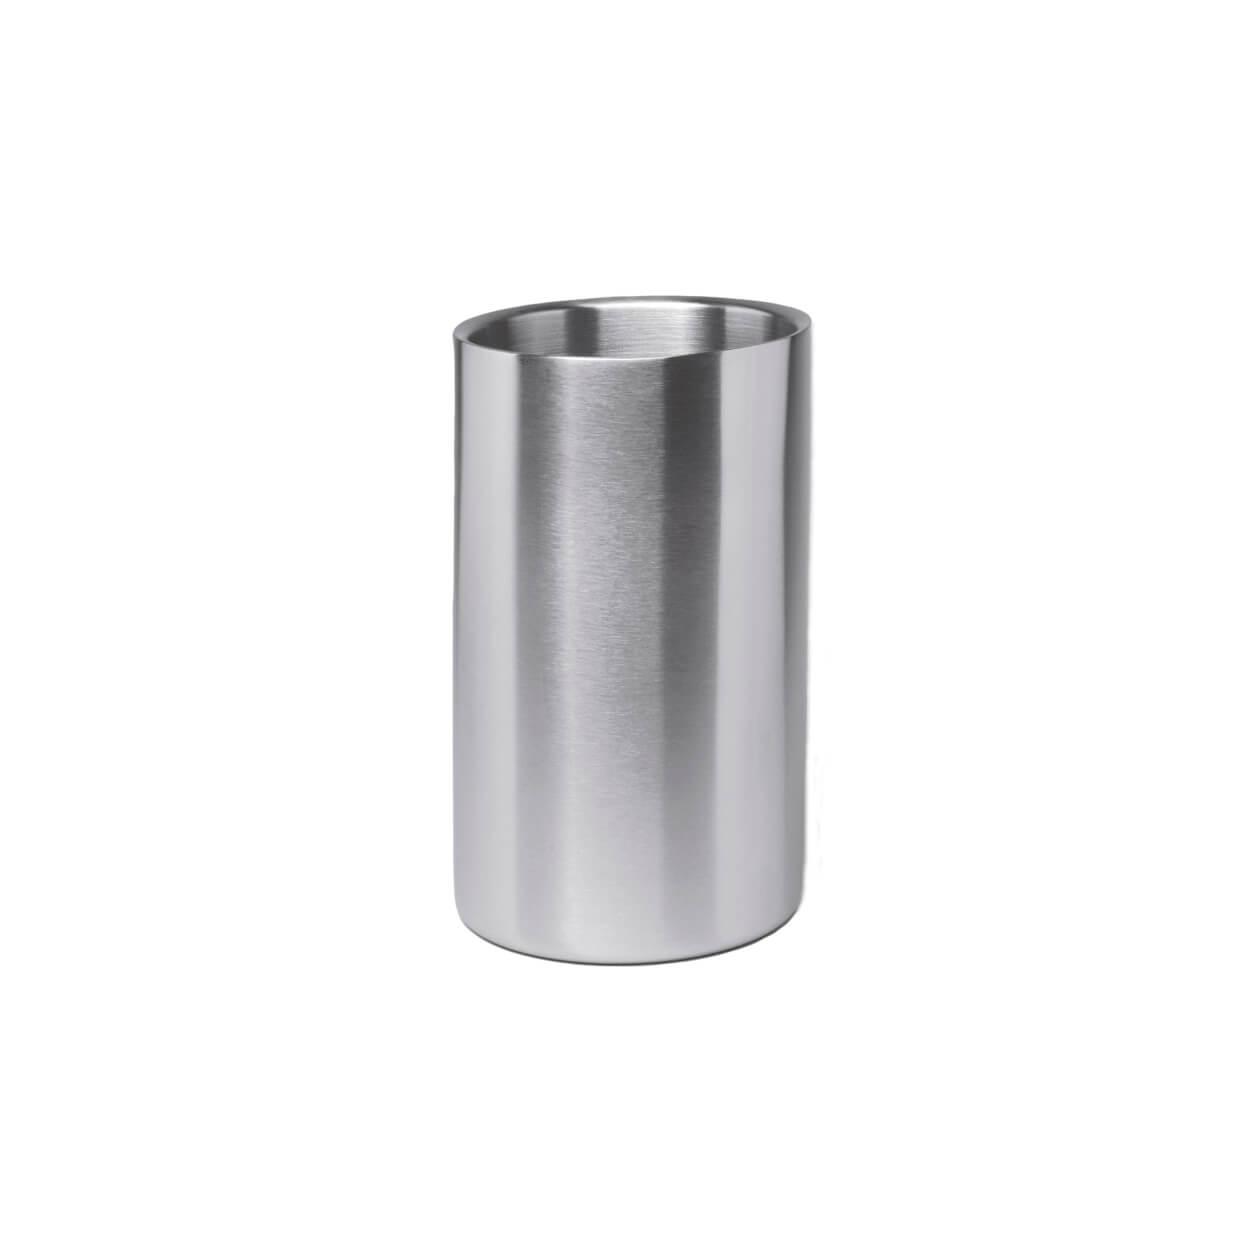 WINE COOLER, INOX, ΙΣΟΘΕΡΜΙΚΟ 12,5×10,5×20εκ